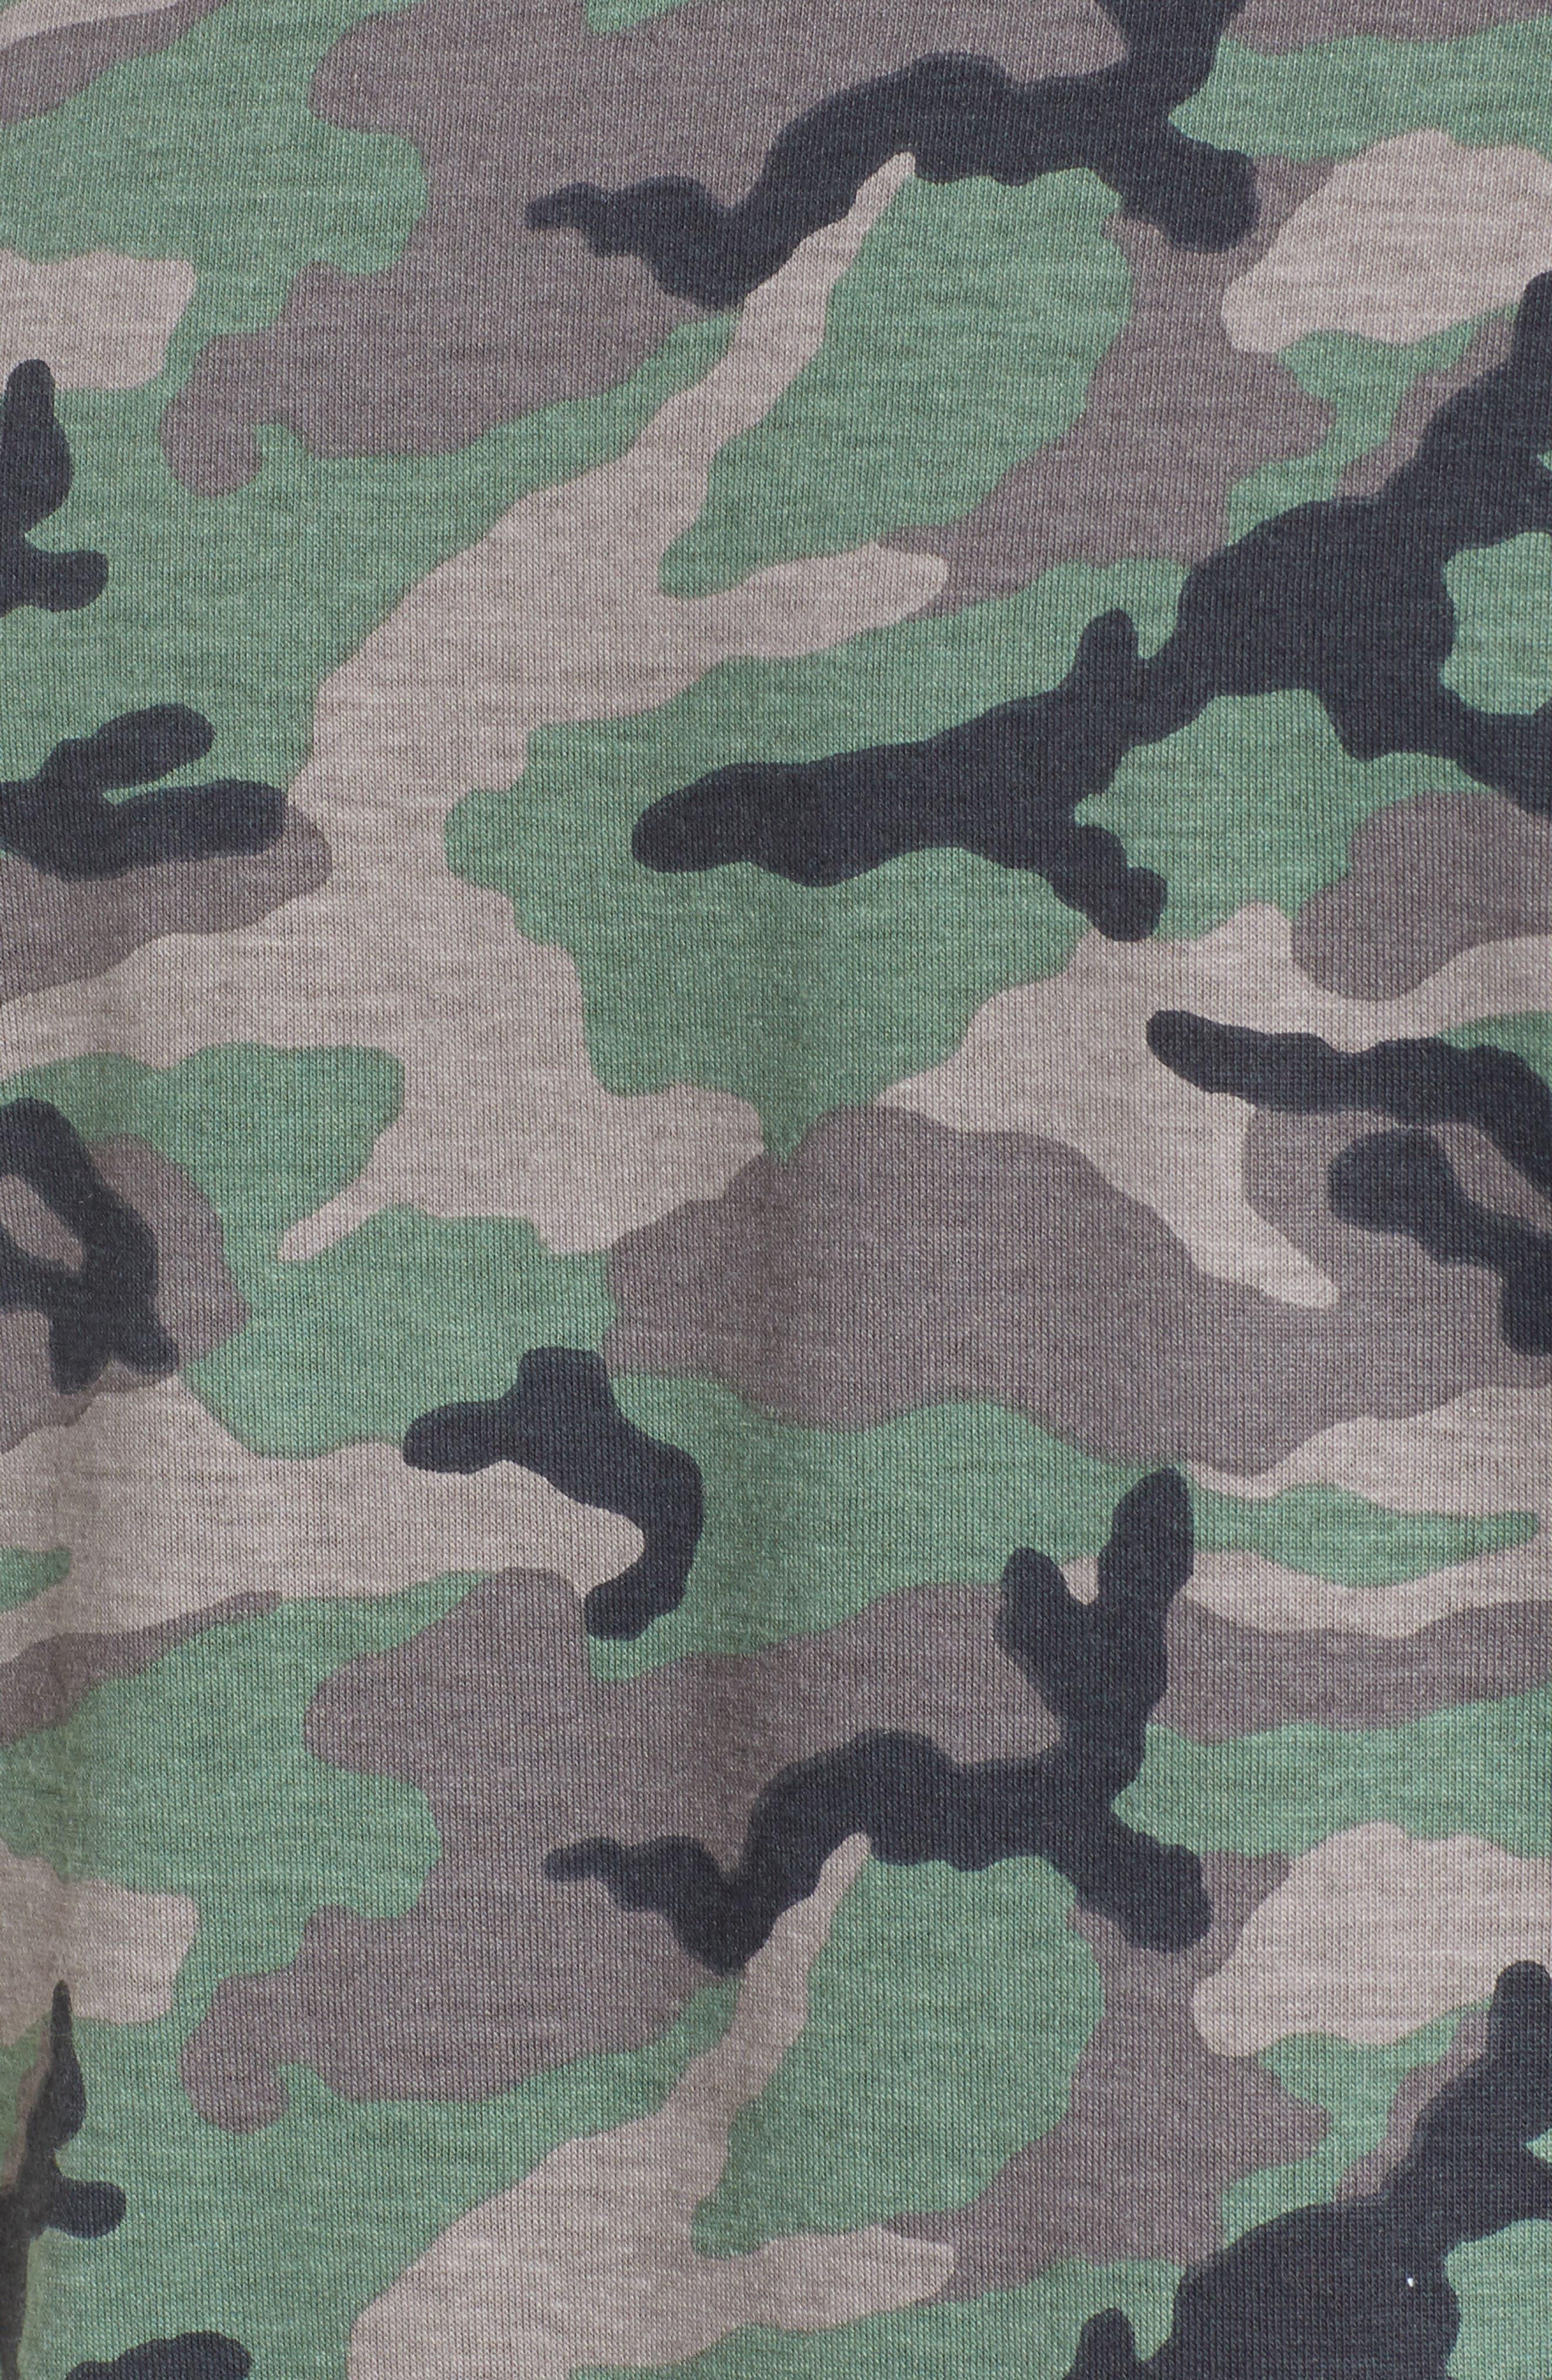 Camo Print Ringer T-Shirt,                             Alternate thumbnail 5, color,                             Brown Green Camo